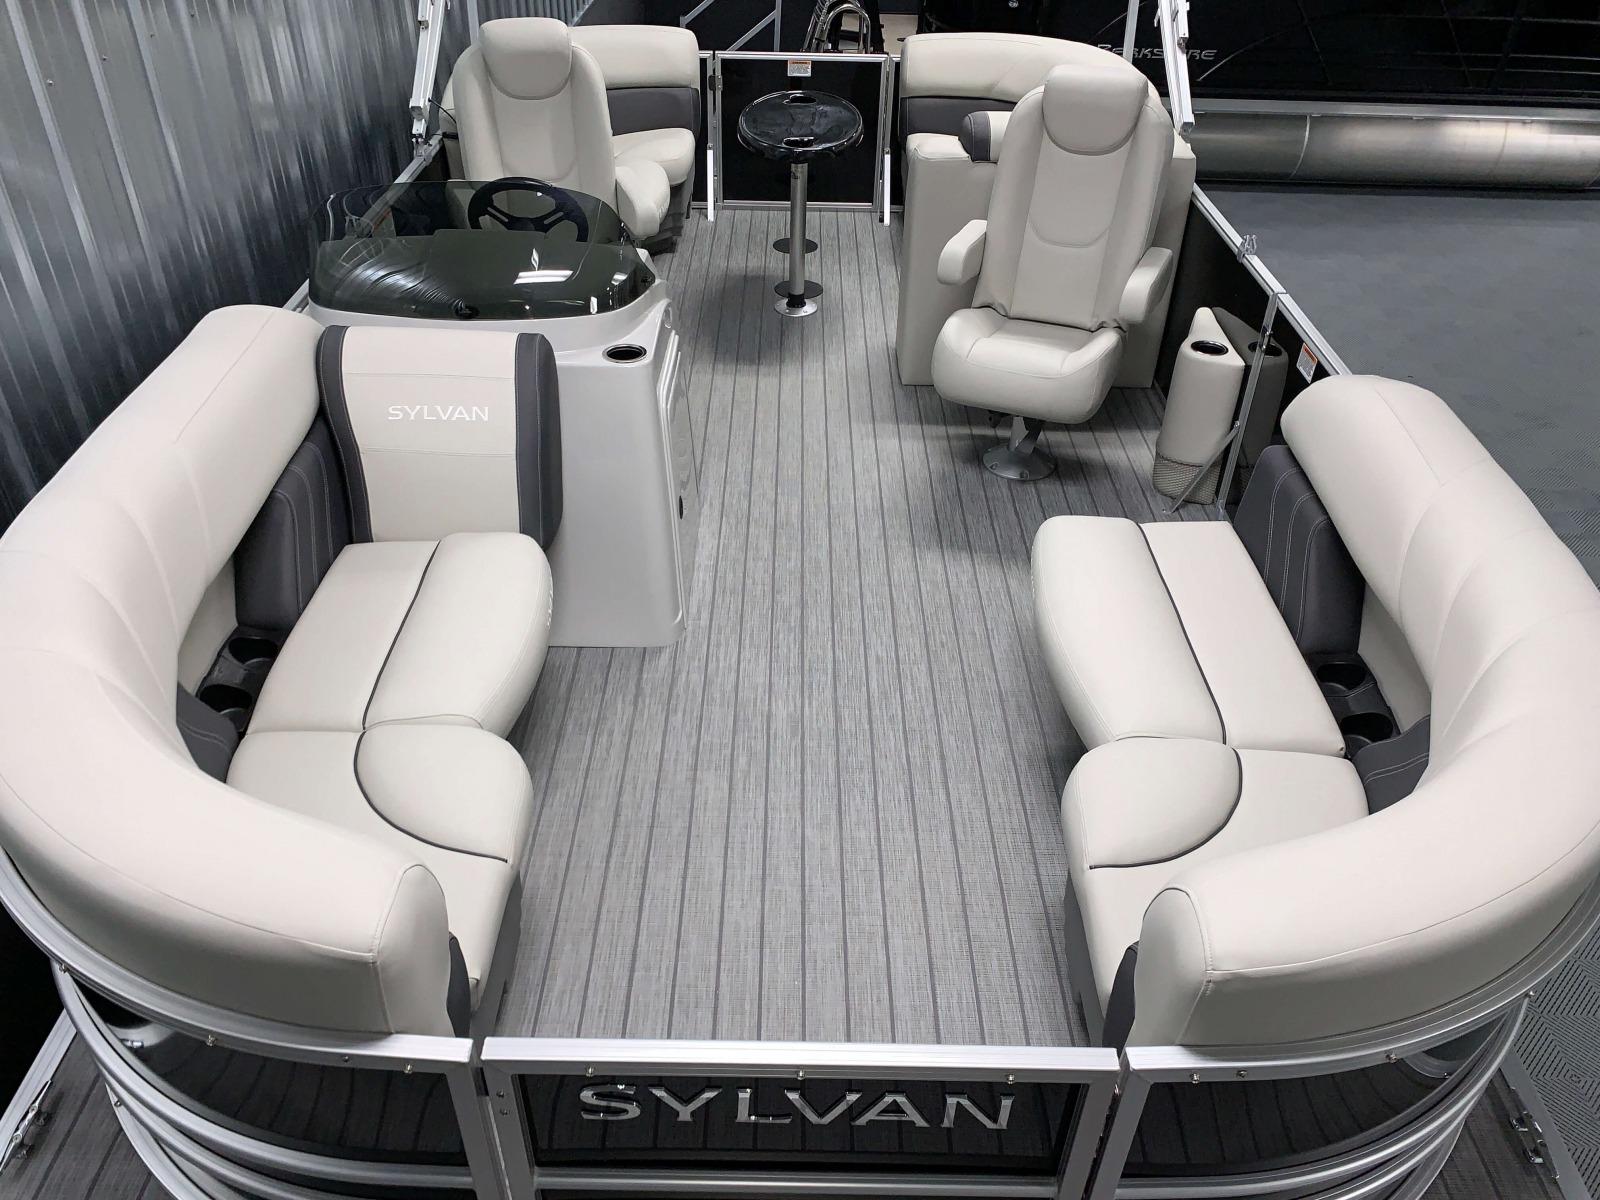 Teak Weave Vinyl Flooring of a 2020 Sylvan Mirage 8520 LZ Tritoon Boat